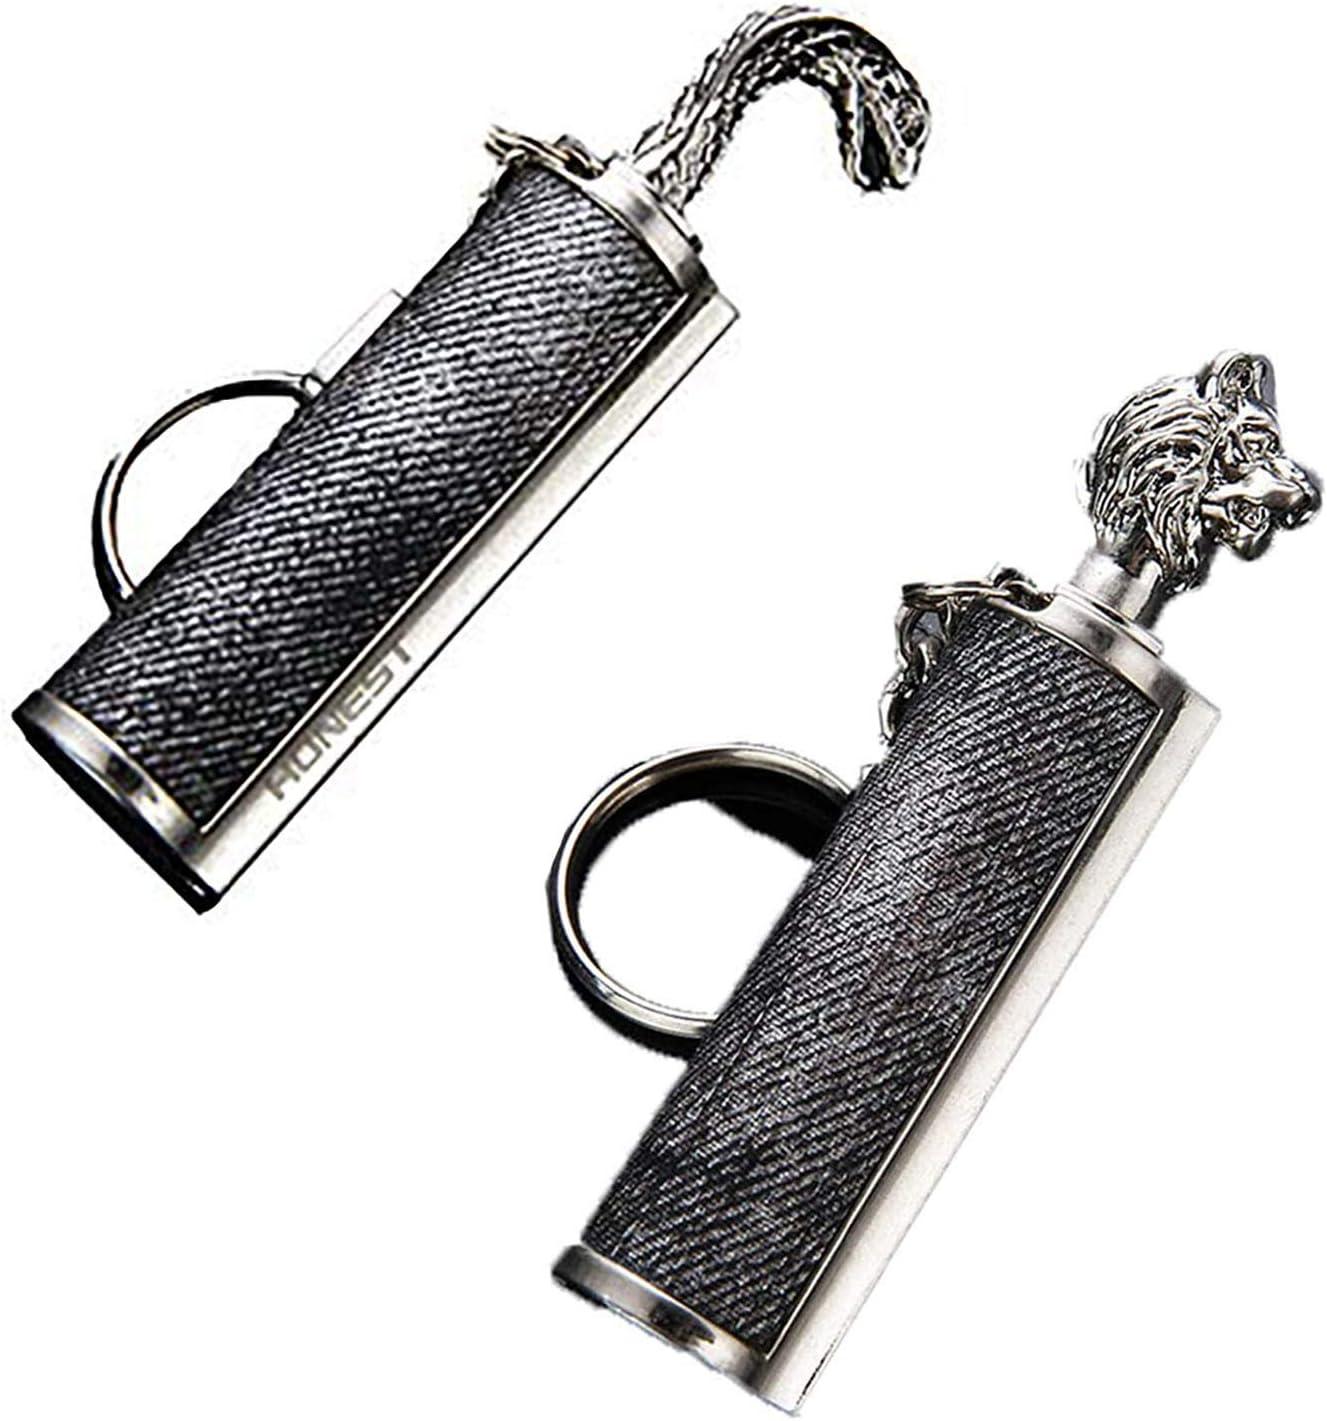 2Pcs Dragón's Breath Immortal Lighter,Llavero De Metal Impermeable Flint Match Stick Kerosene Refillable Starter,Herramienta De Supervivencia De Inicio De Fuego De Flint Reutilizable